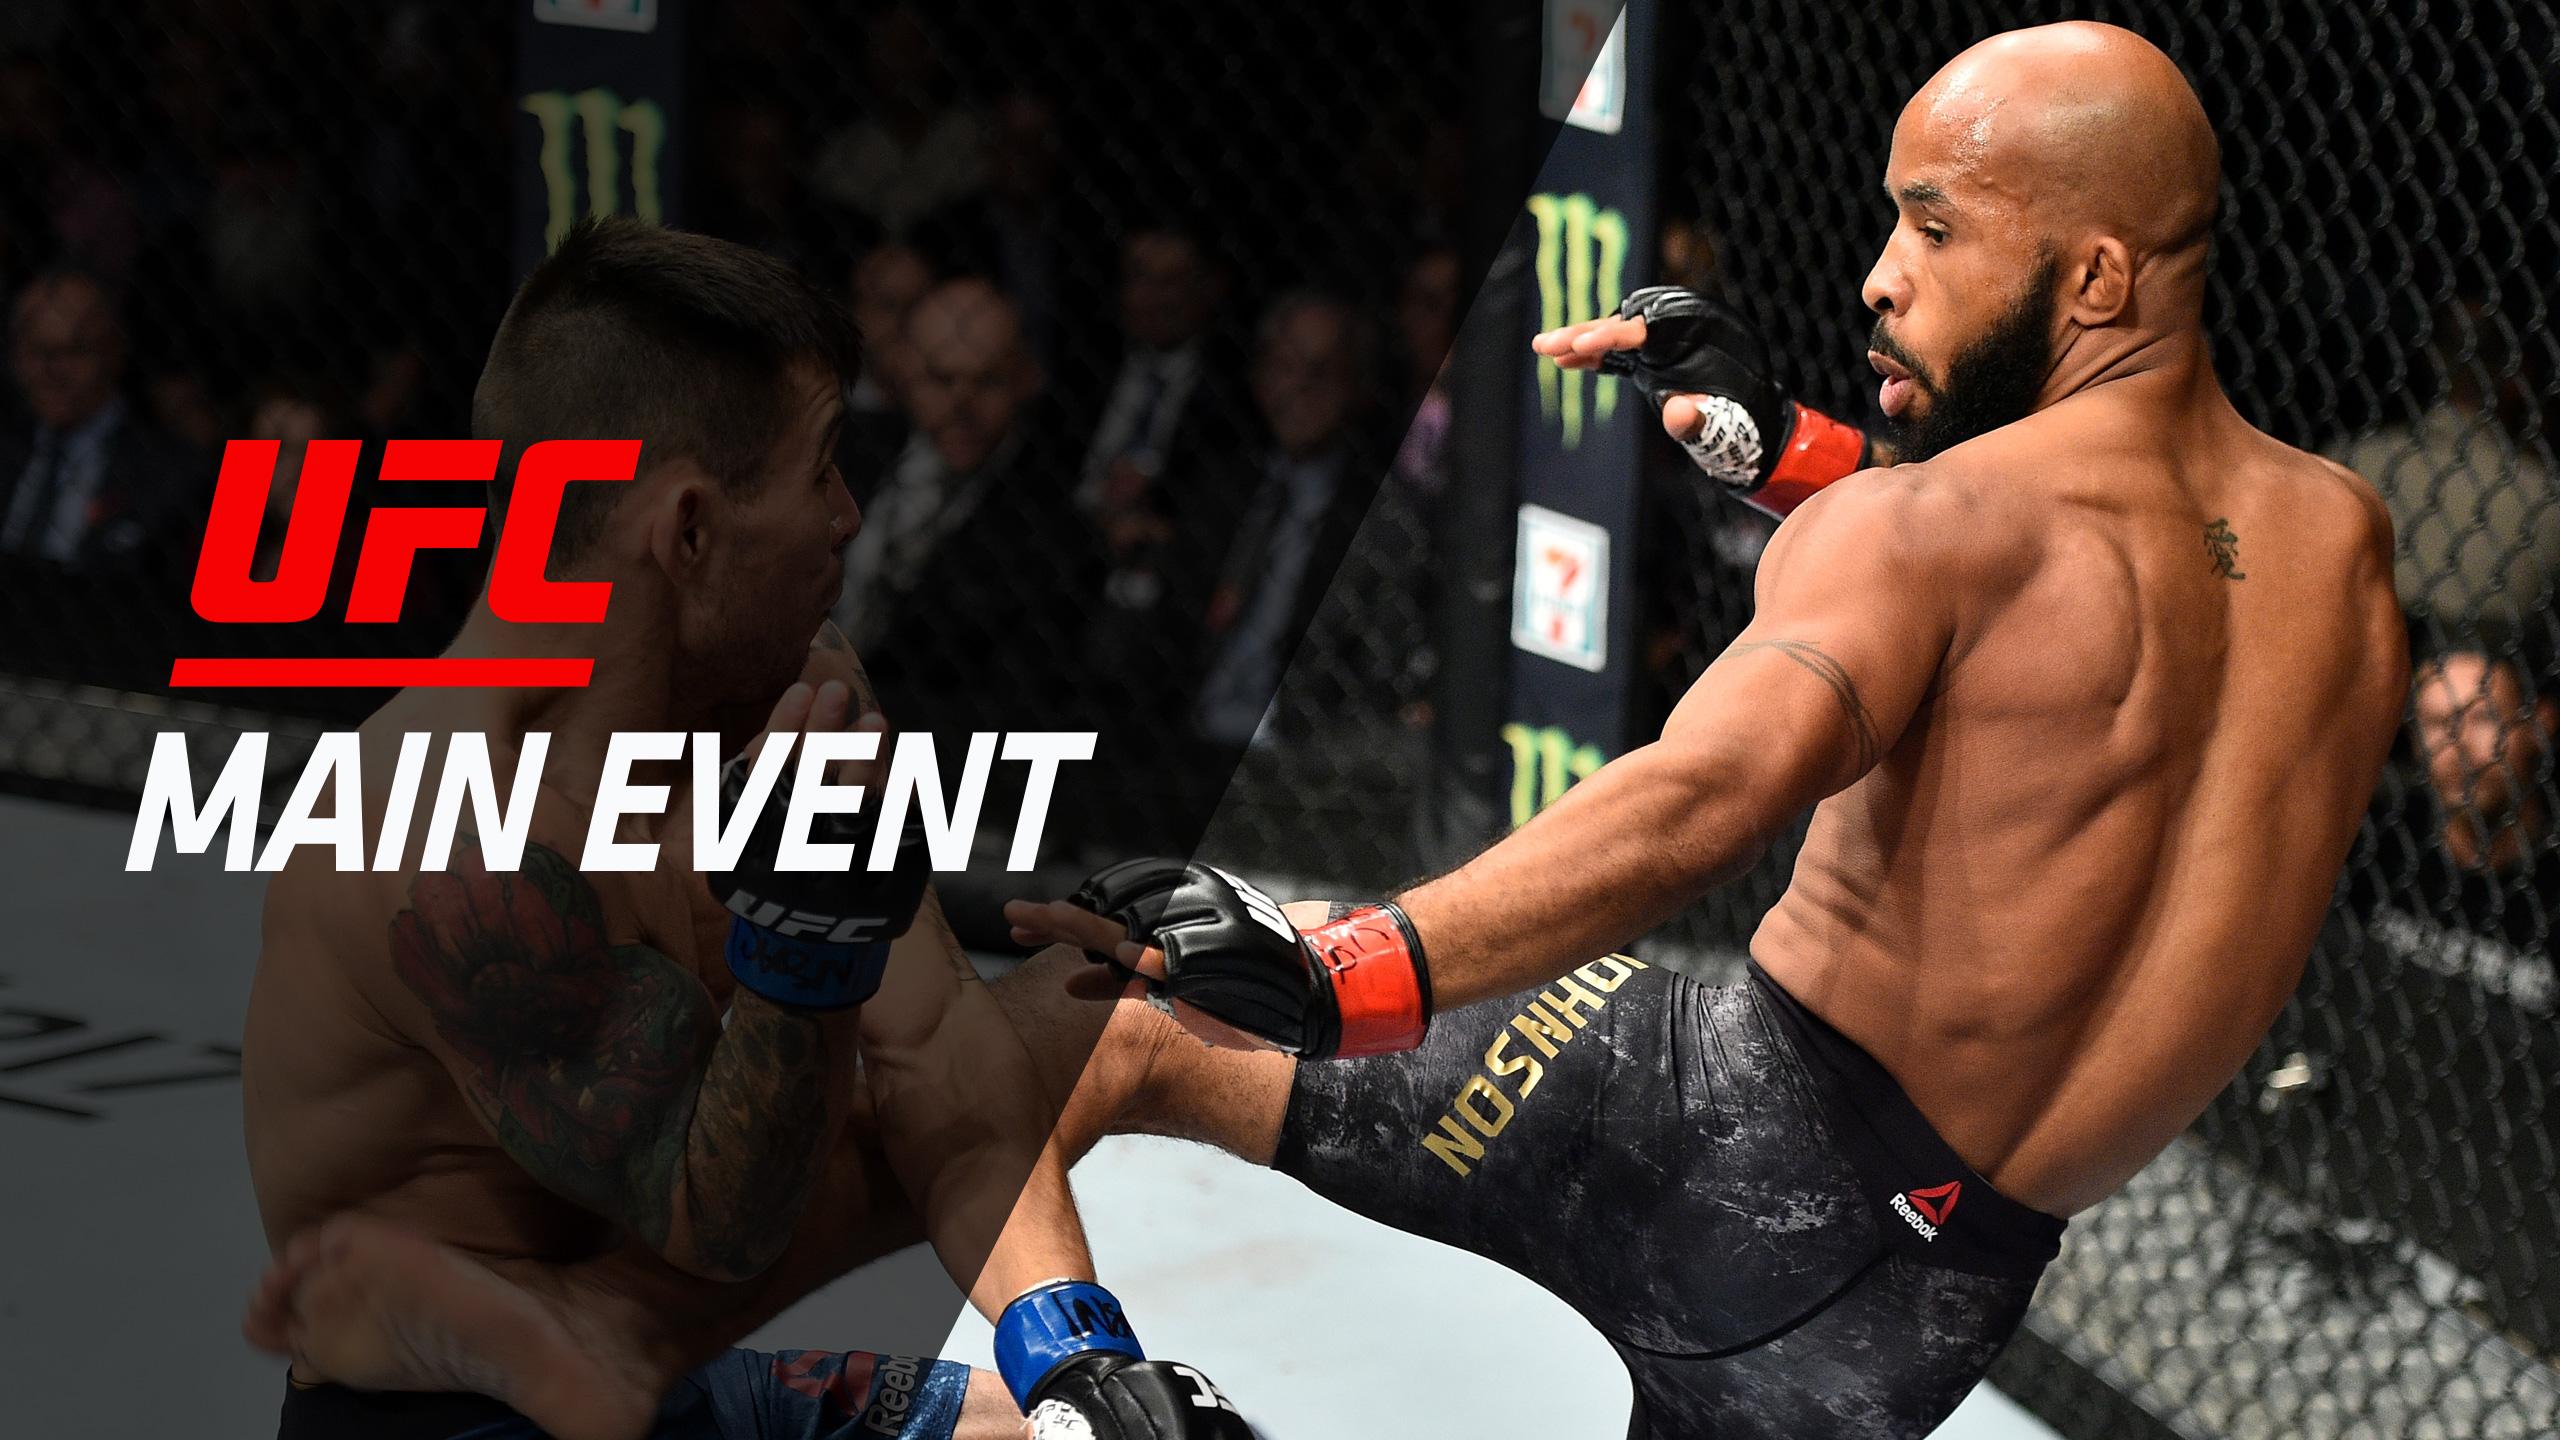 UFC Main Event: Johnson vs. Borg